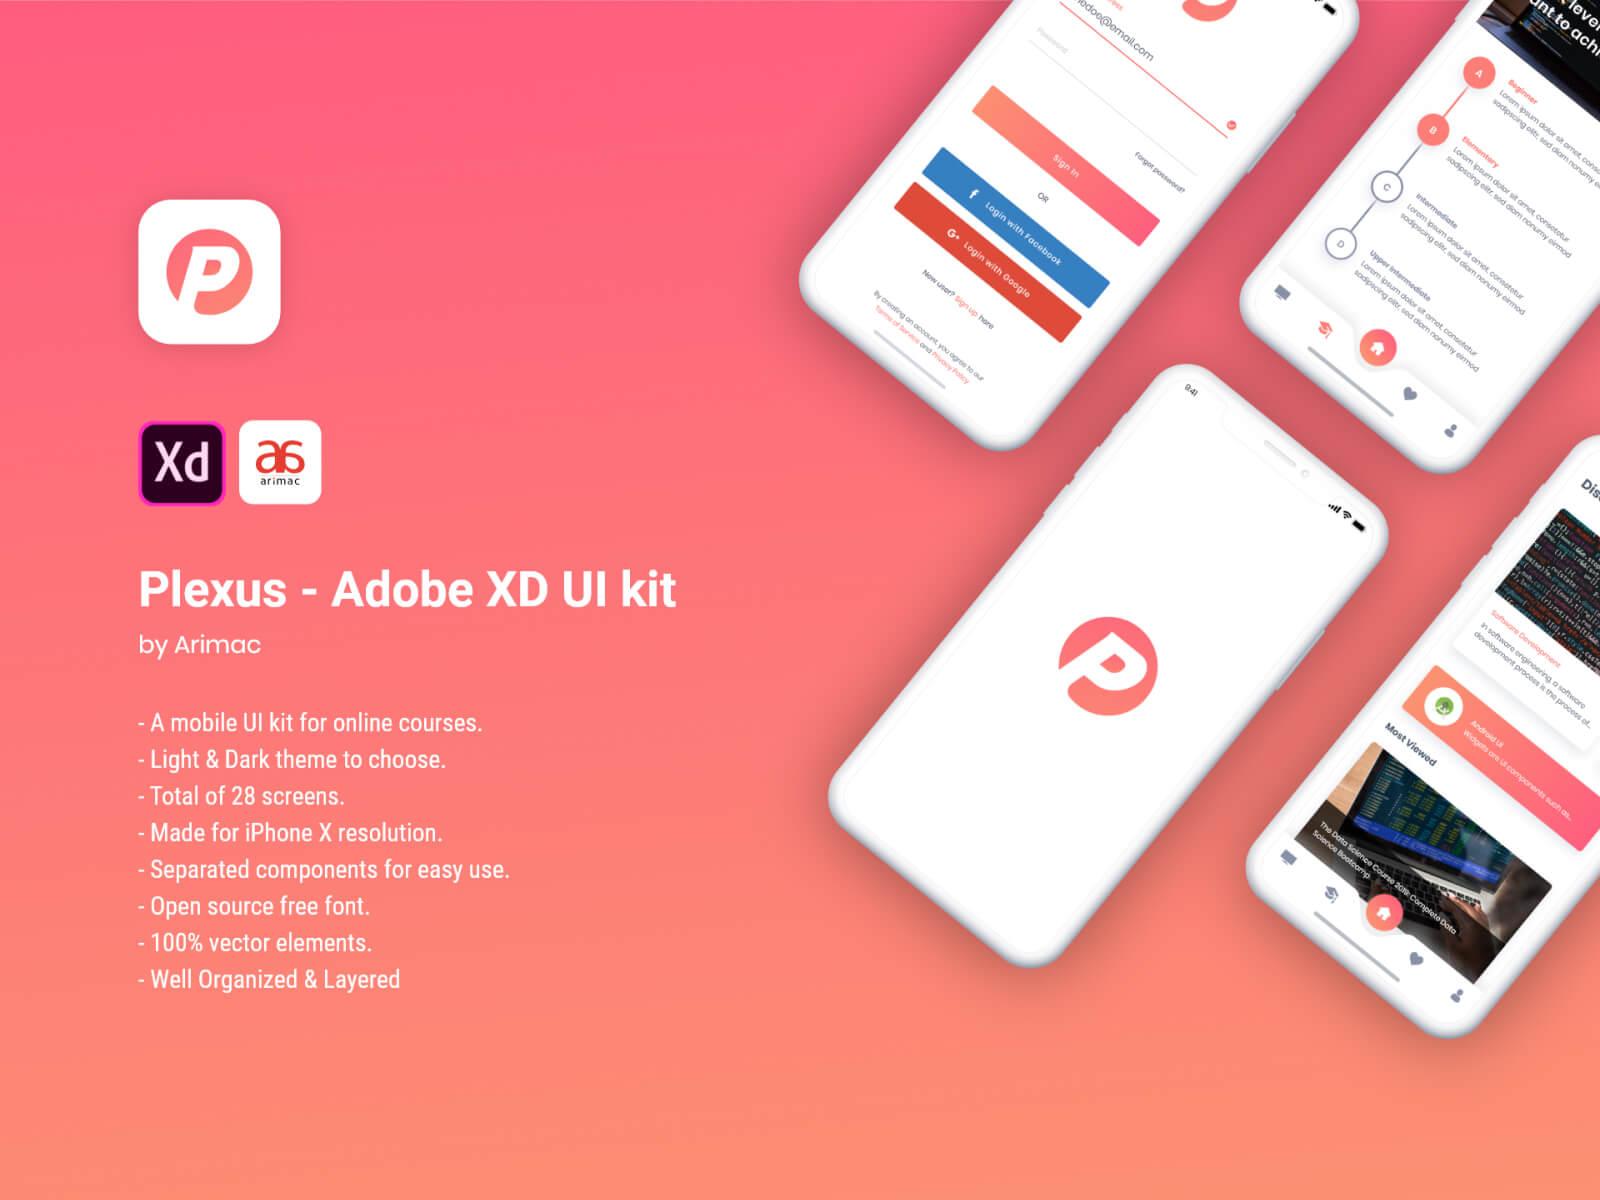 Plexus - Free Adobe XD UI Kit cover image